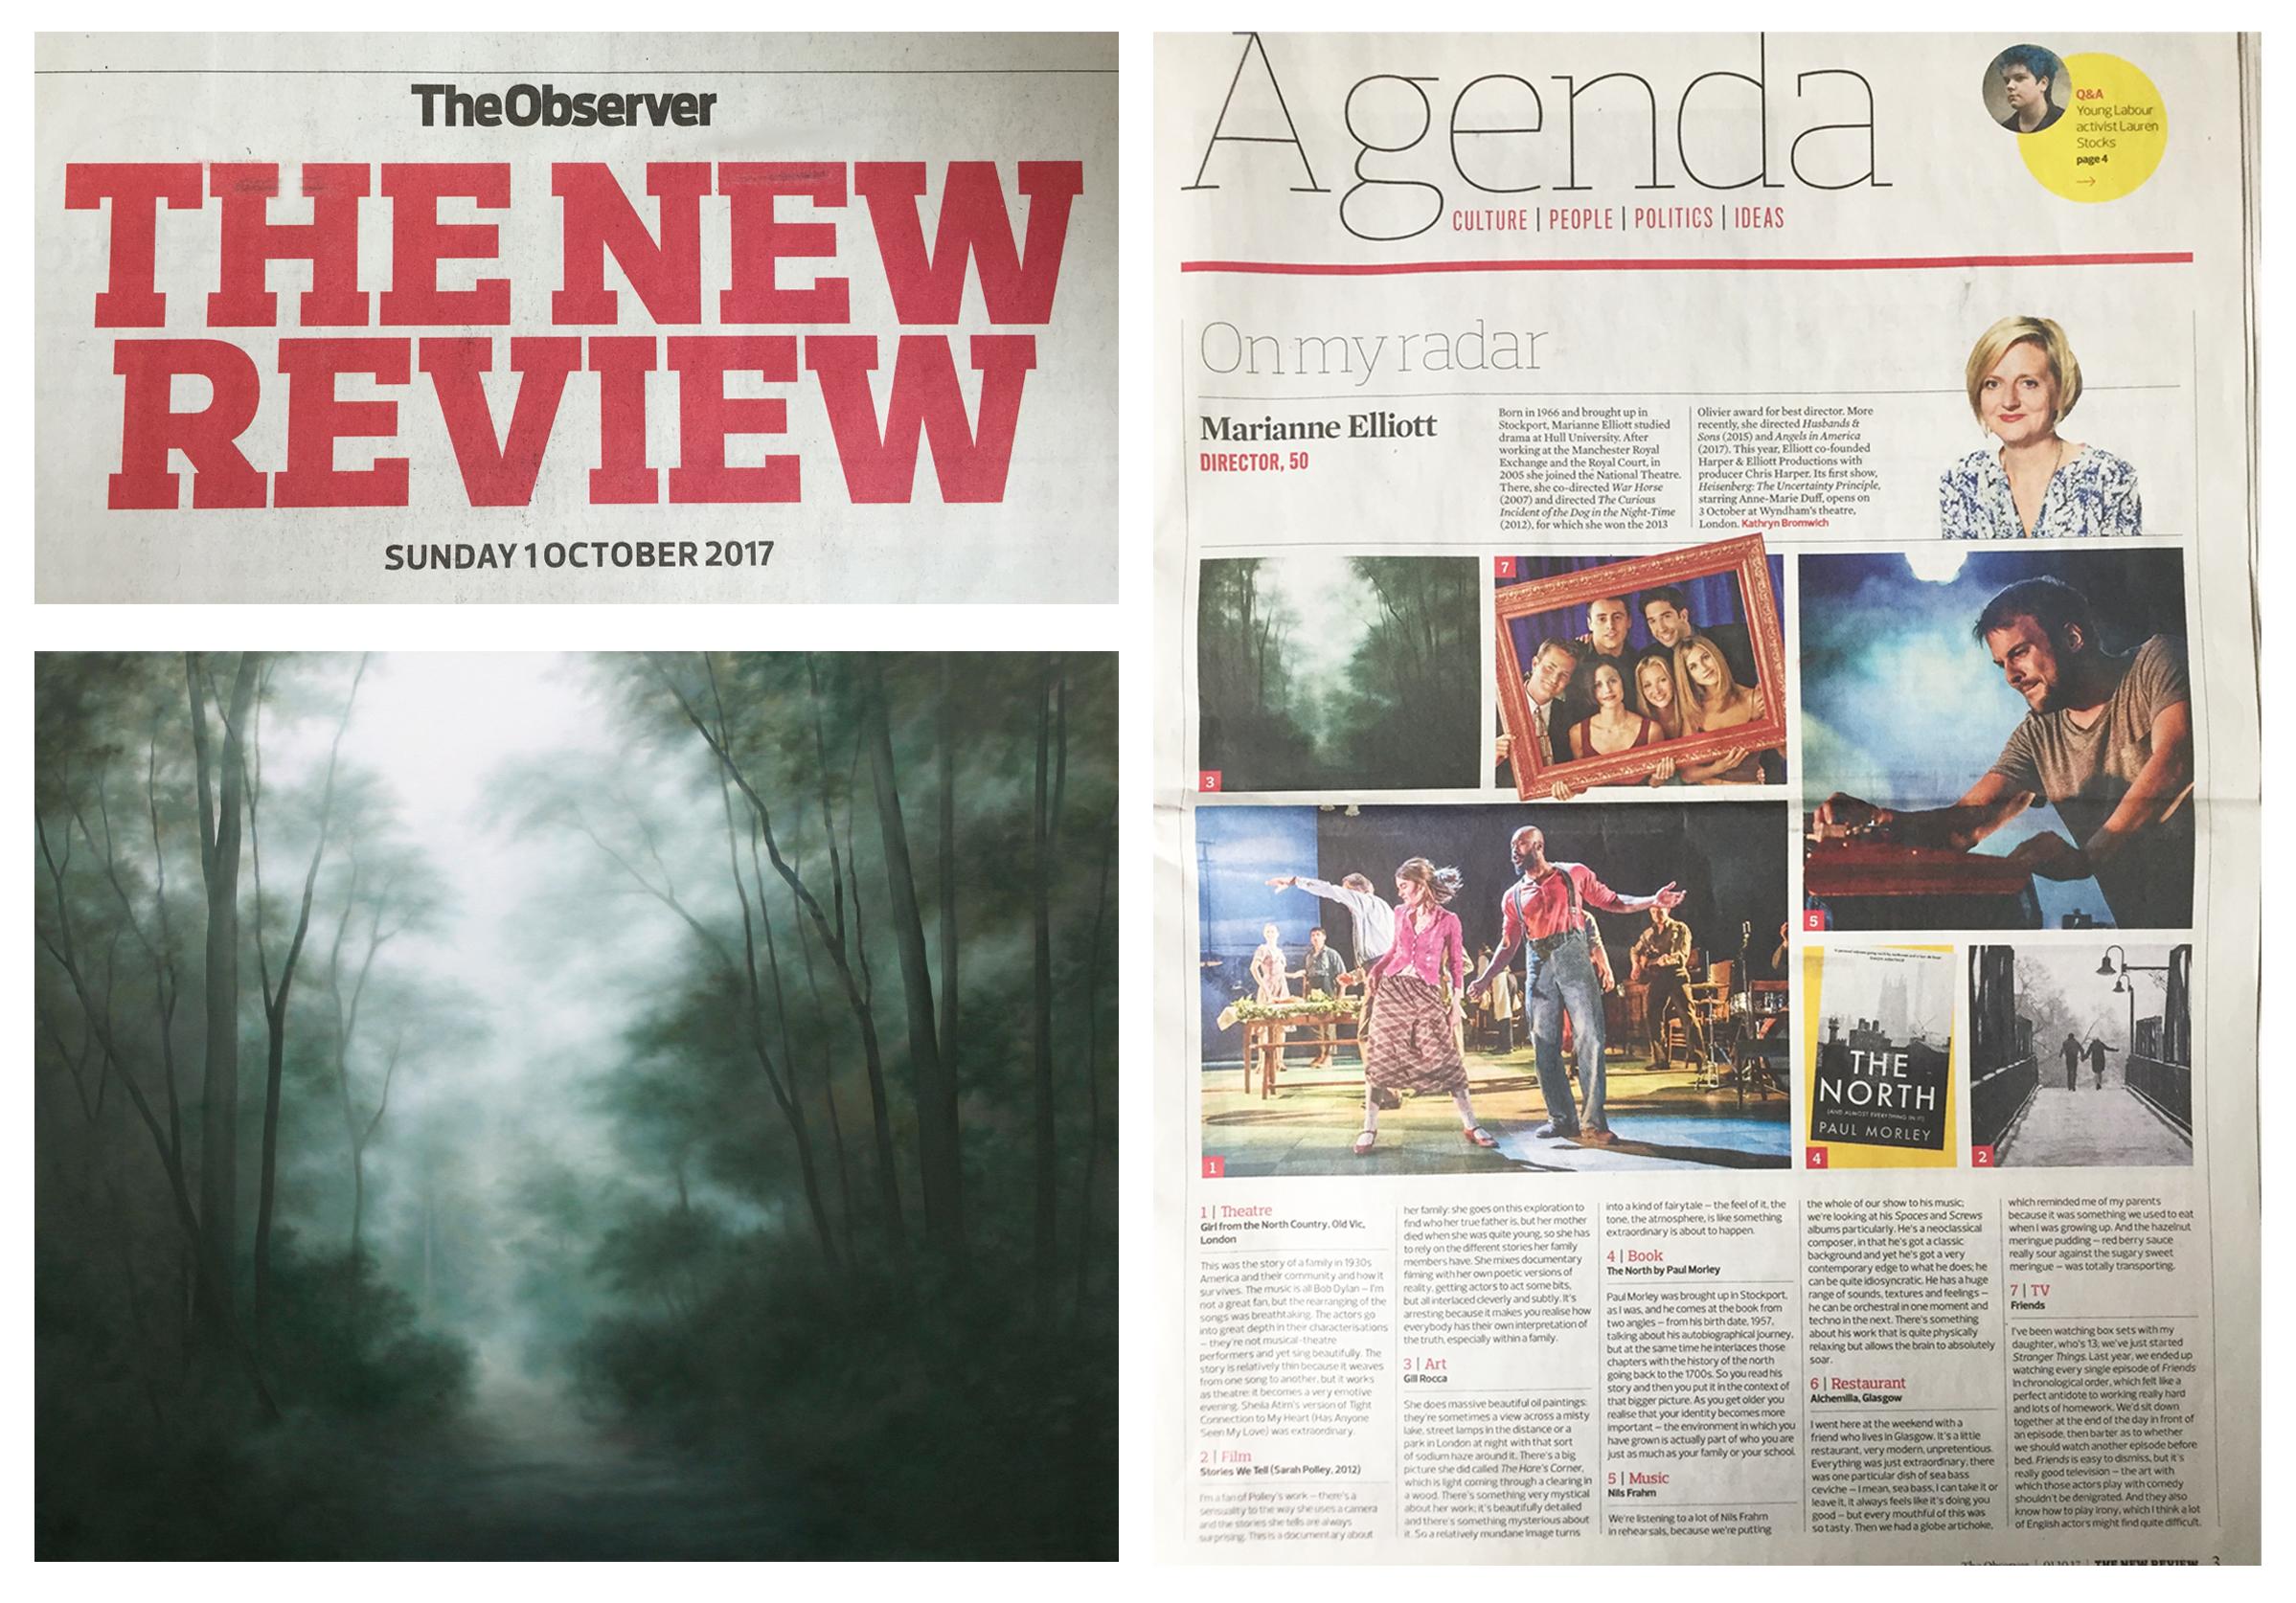 On My Radar: Marianne Elliott's Cultural Highlights | The Guardian 01.10.17  www.theguardian.com/culture/2017/oct/01/marianne-elliott-cultural-highlights